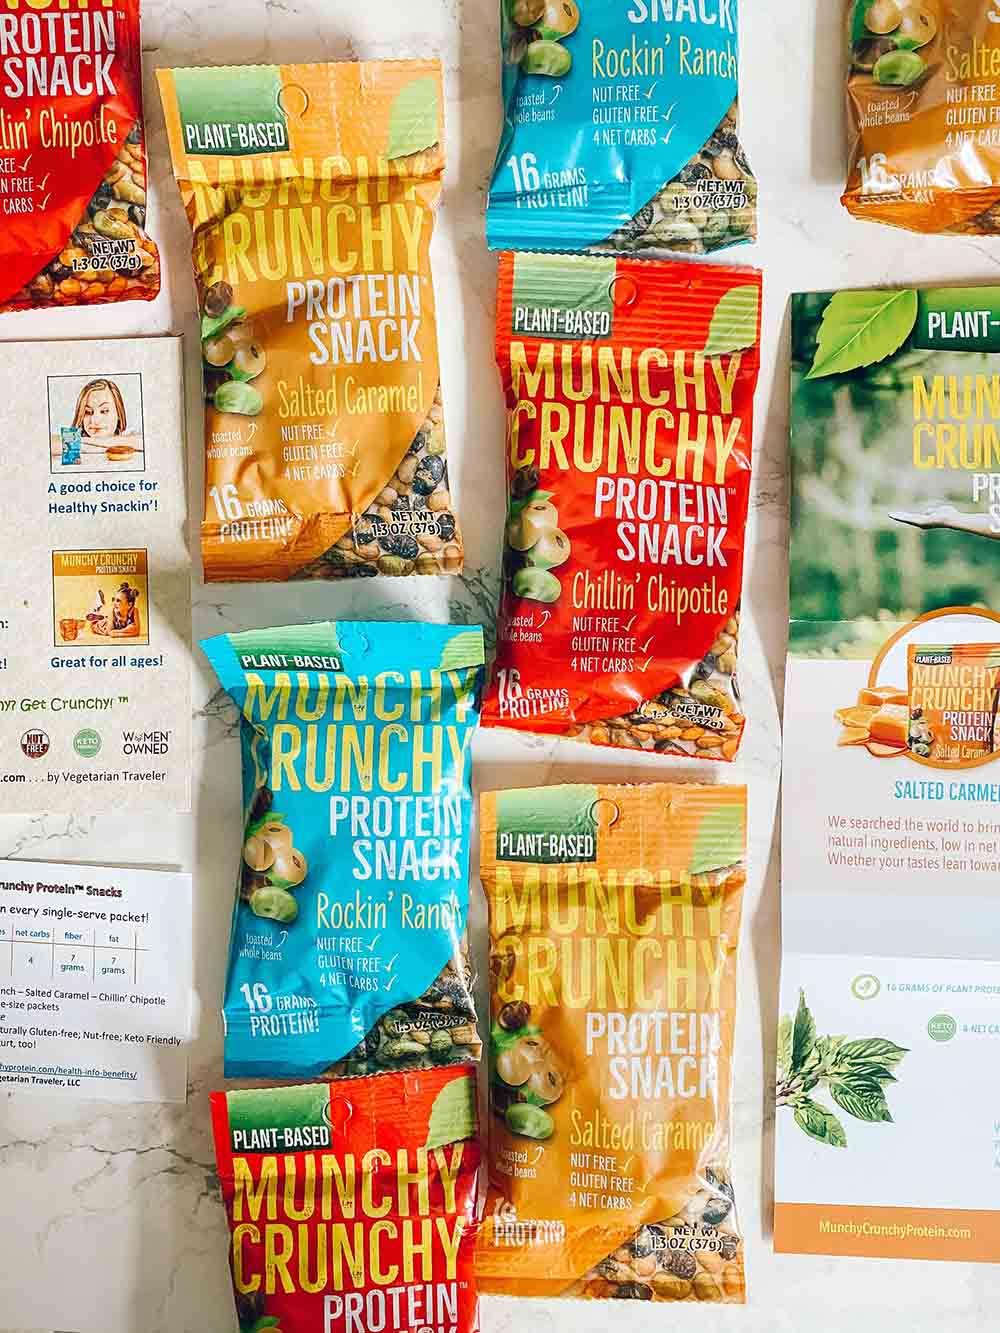 Honest Review: We Tried Munchy Crunchy Vegetarian Protein Snacks!